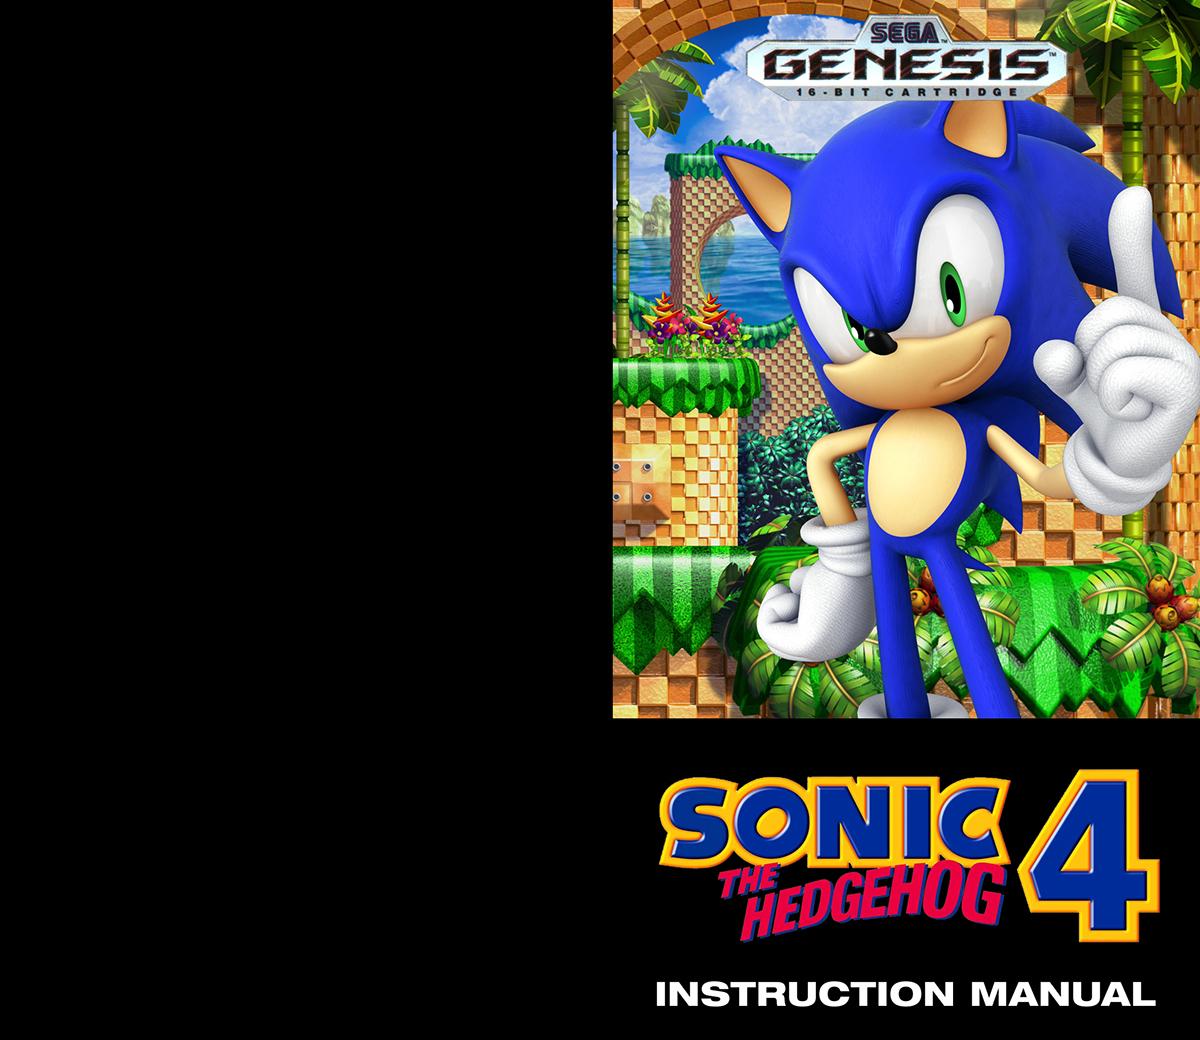 SEGA genesis 16-bit Sonic the Hedgehog Video Games